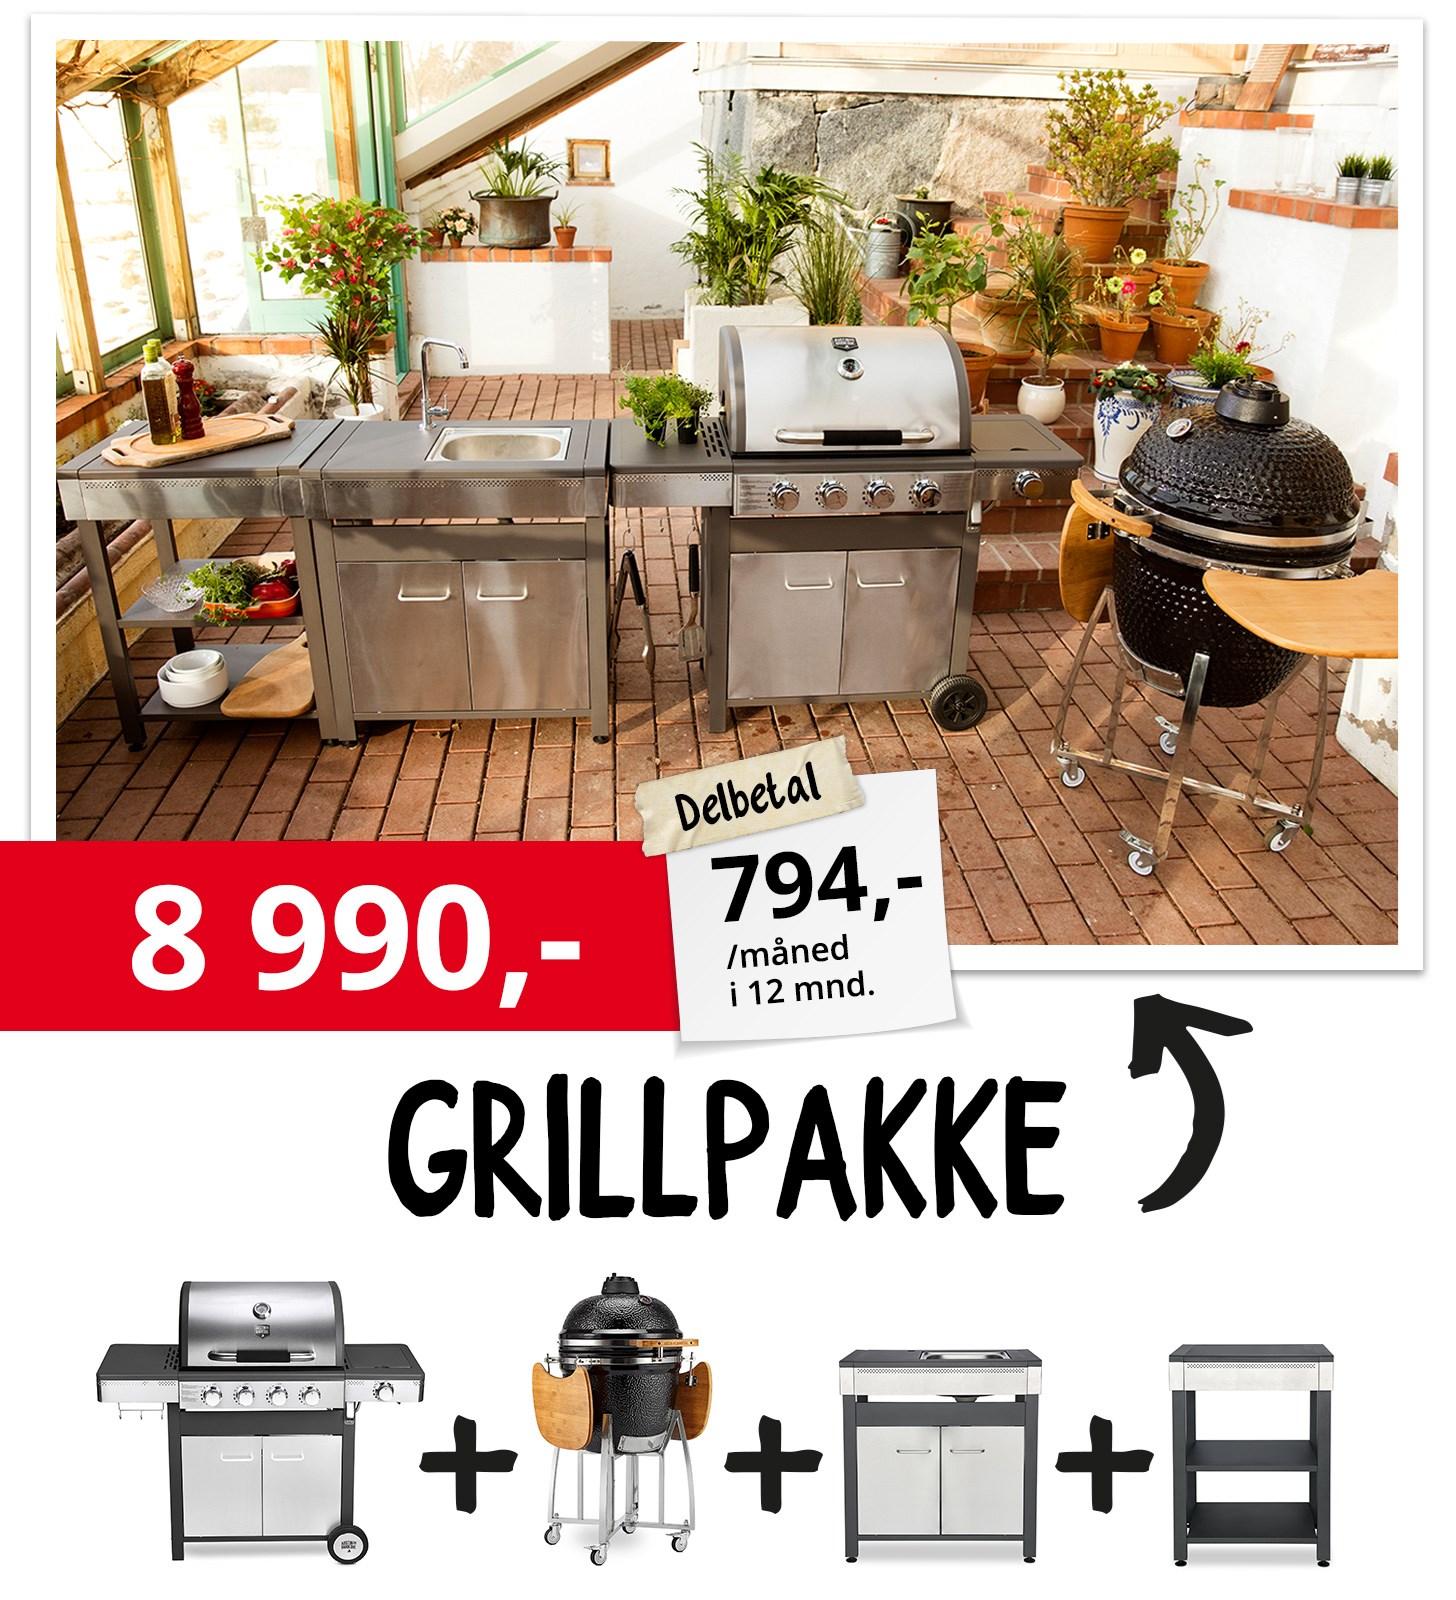 Grillpakke 8990,-